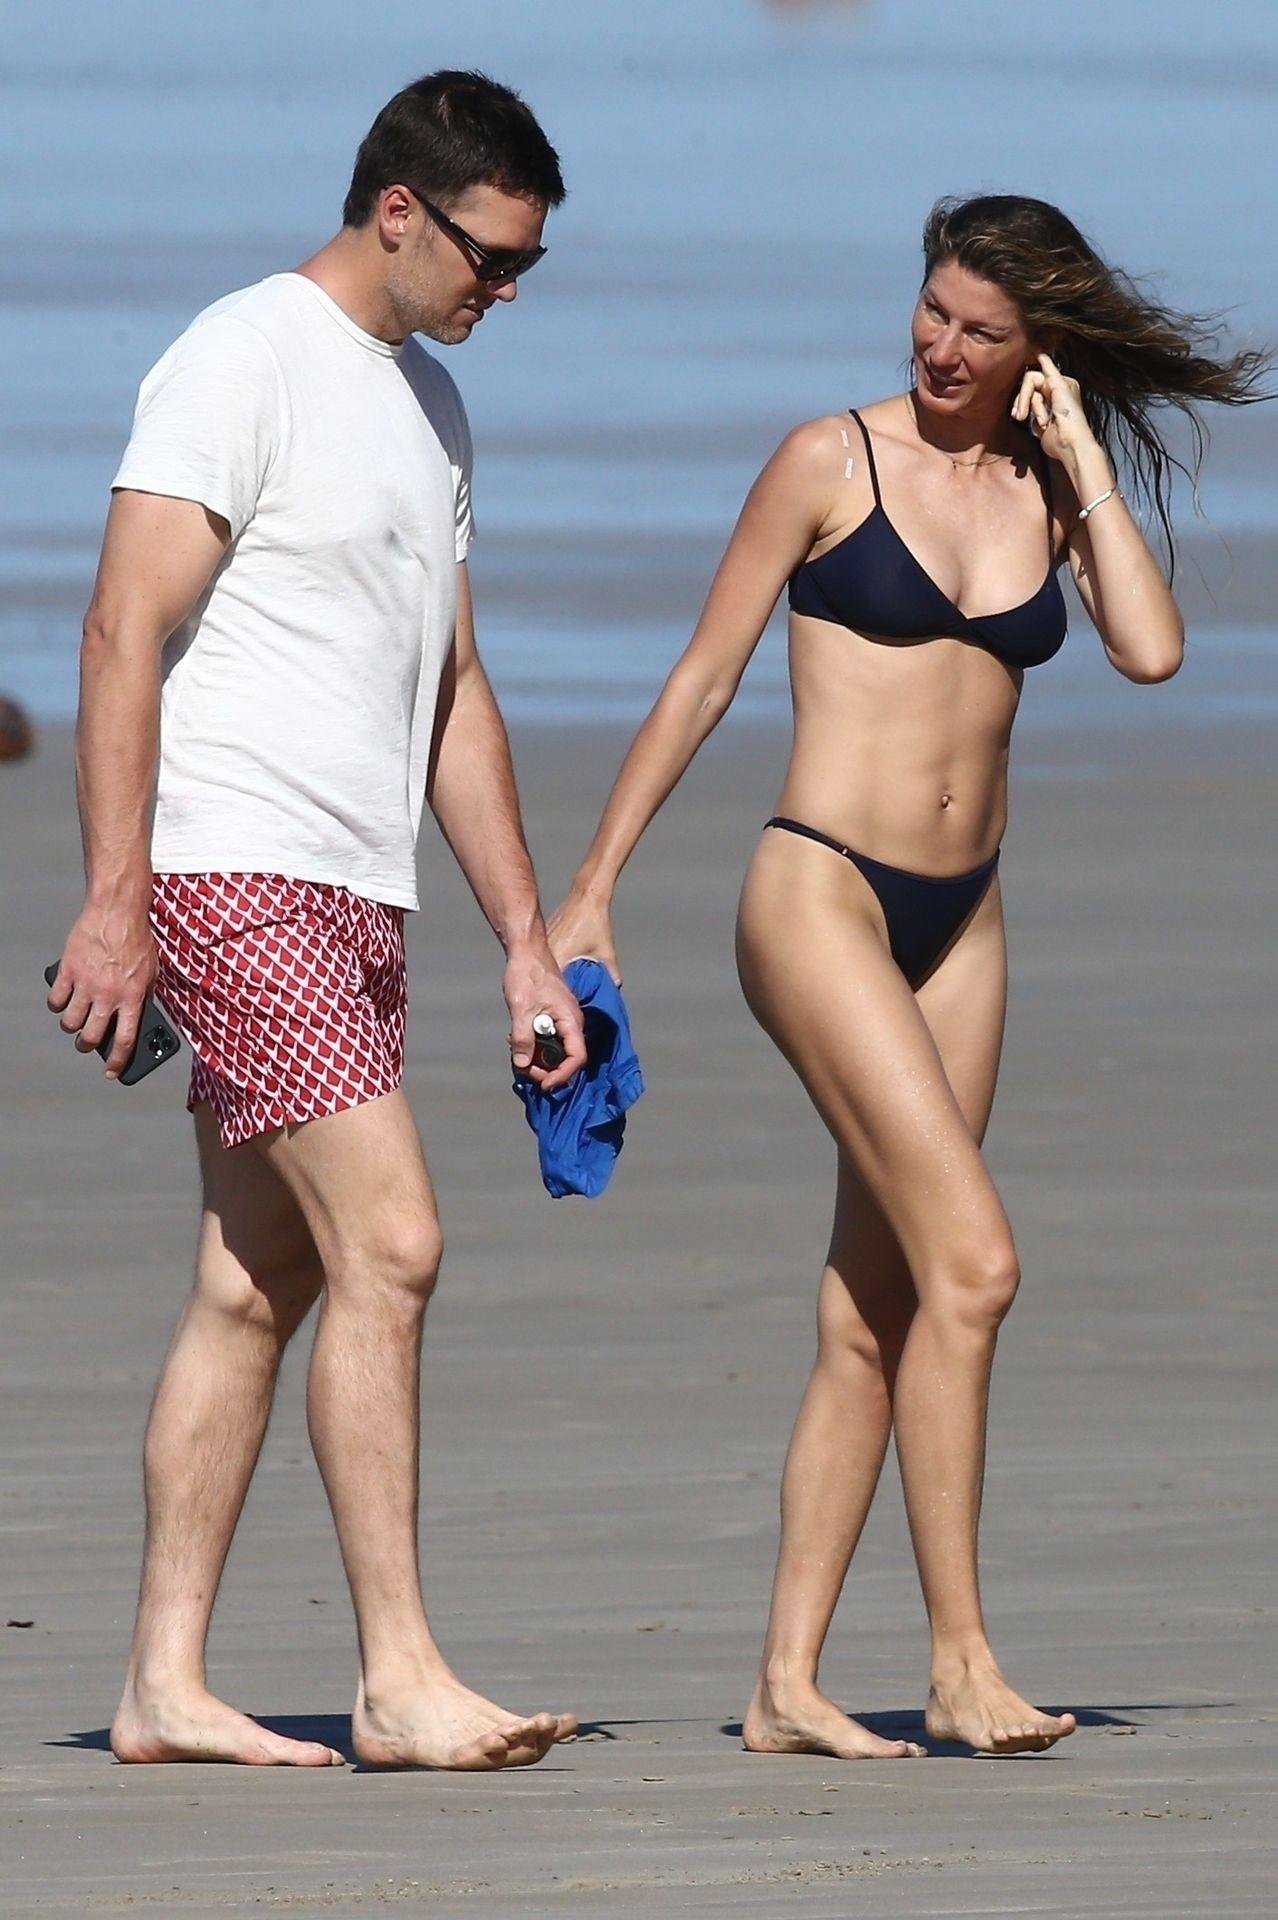 Tom Brady & Gisele Bundchen Pack On The Pda At The Beach 0001